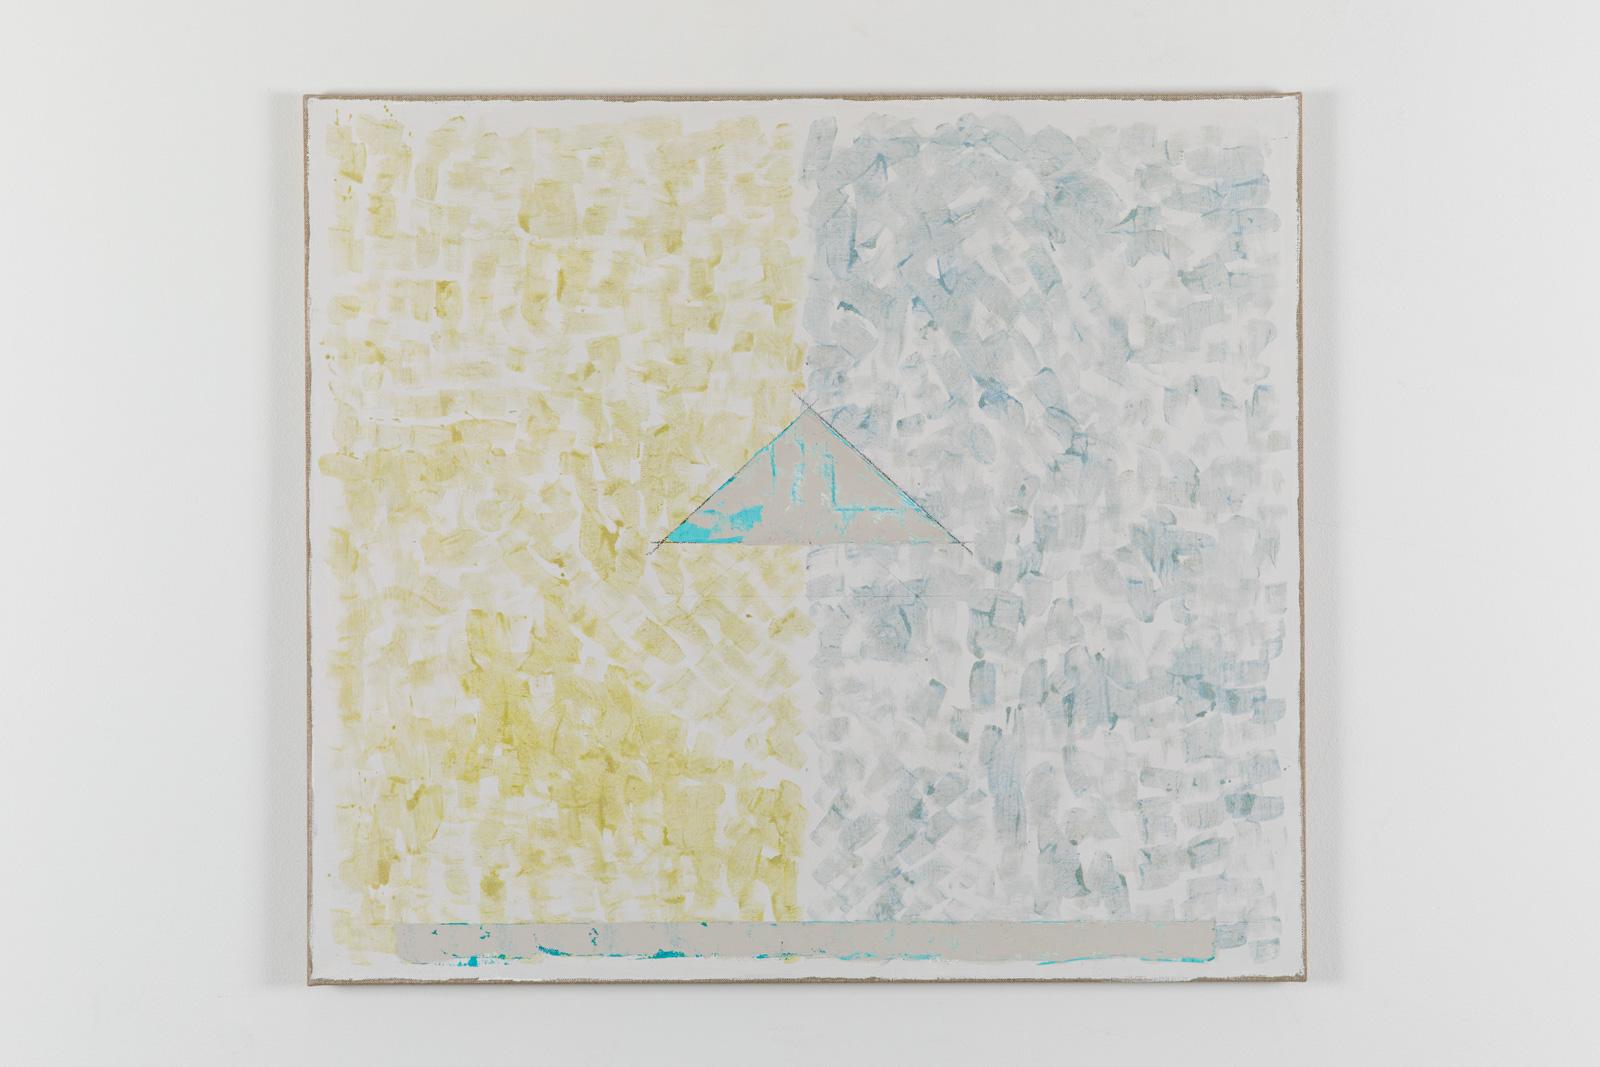 Vila Ziza 6, 2018, Egg tempera on canvas, 80 x 90 cm